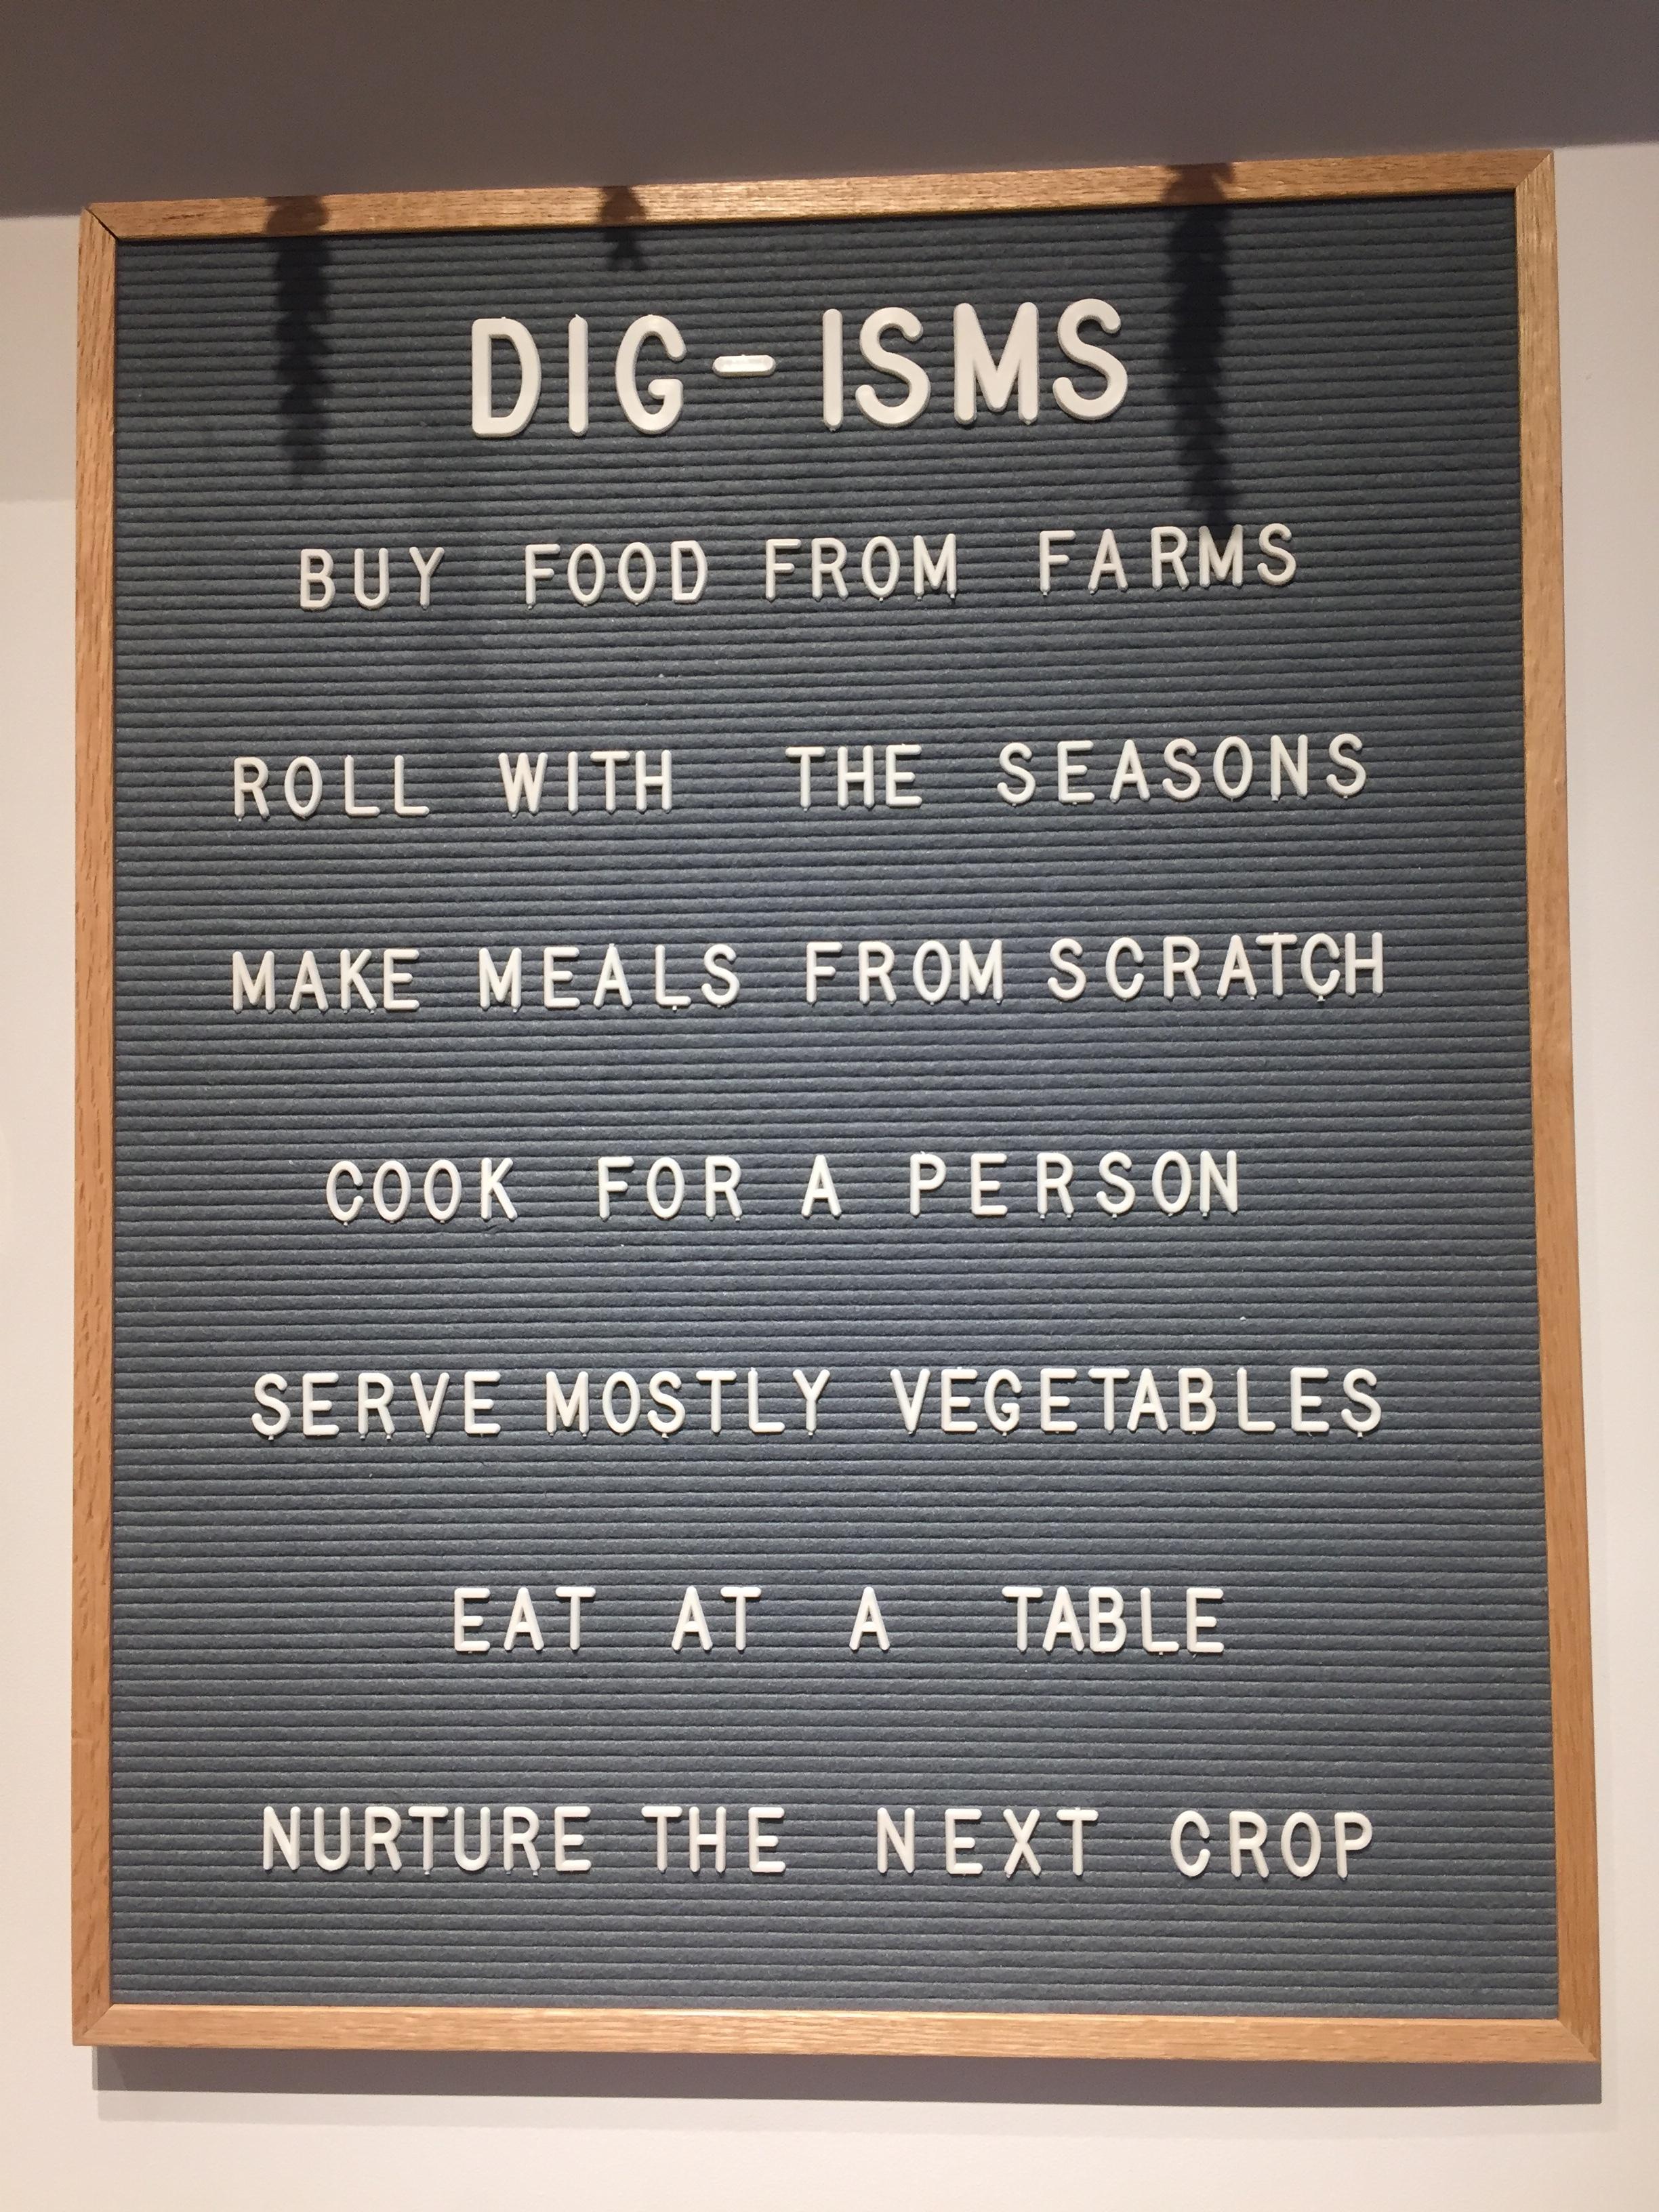 Dig Inn Mission